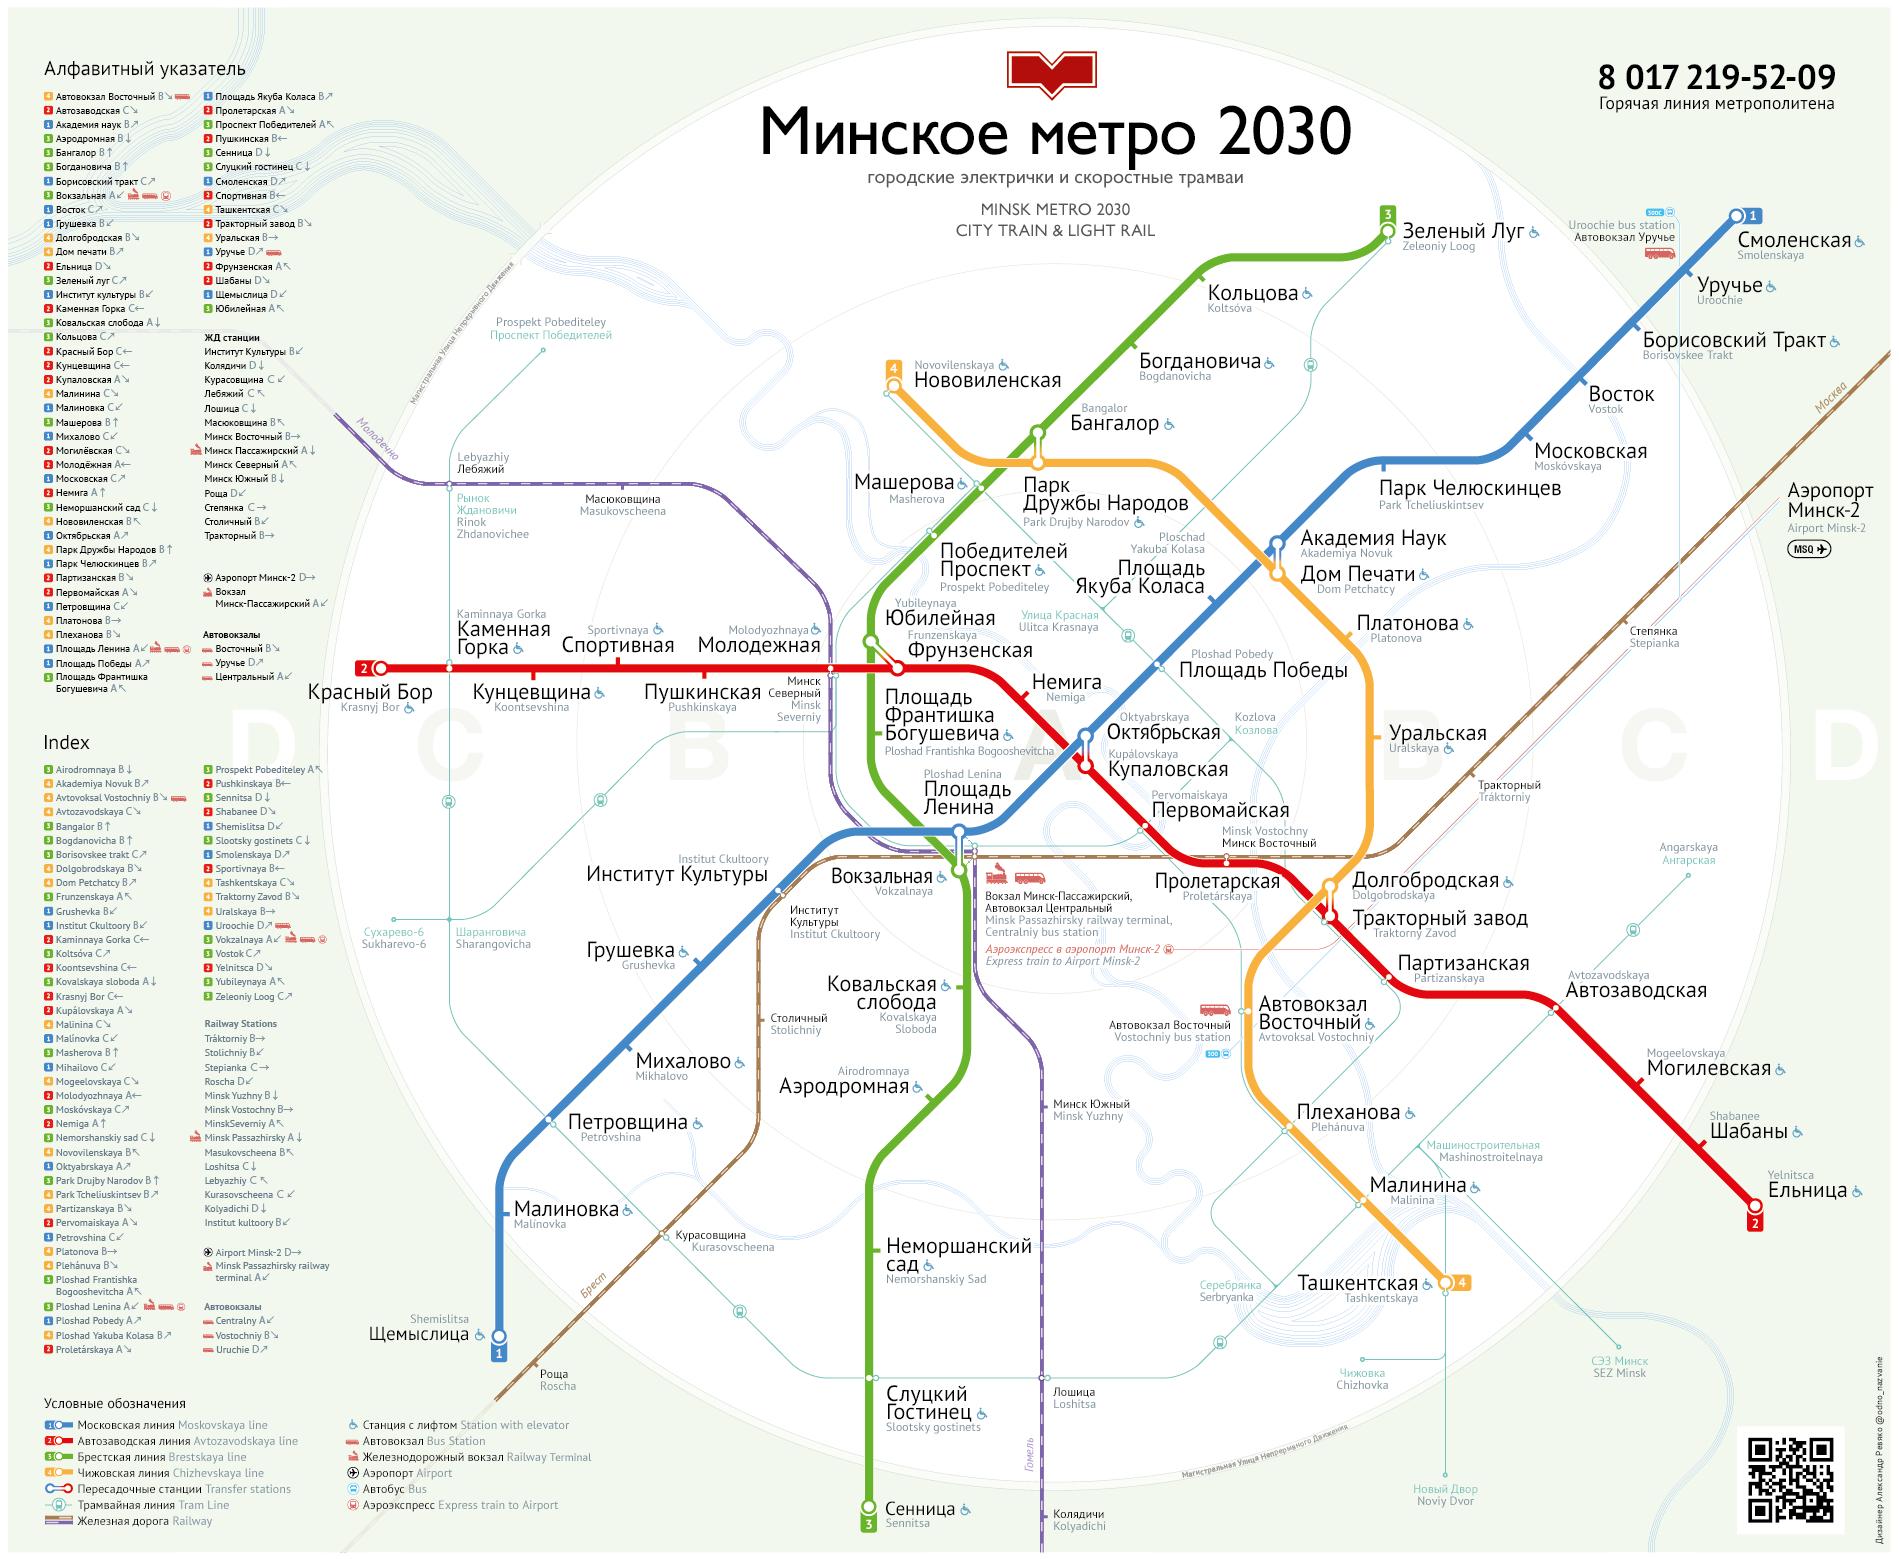 Схема станций метро киев фото 481